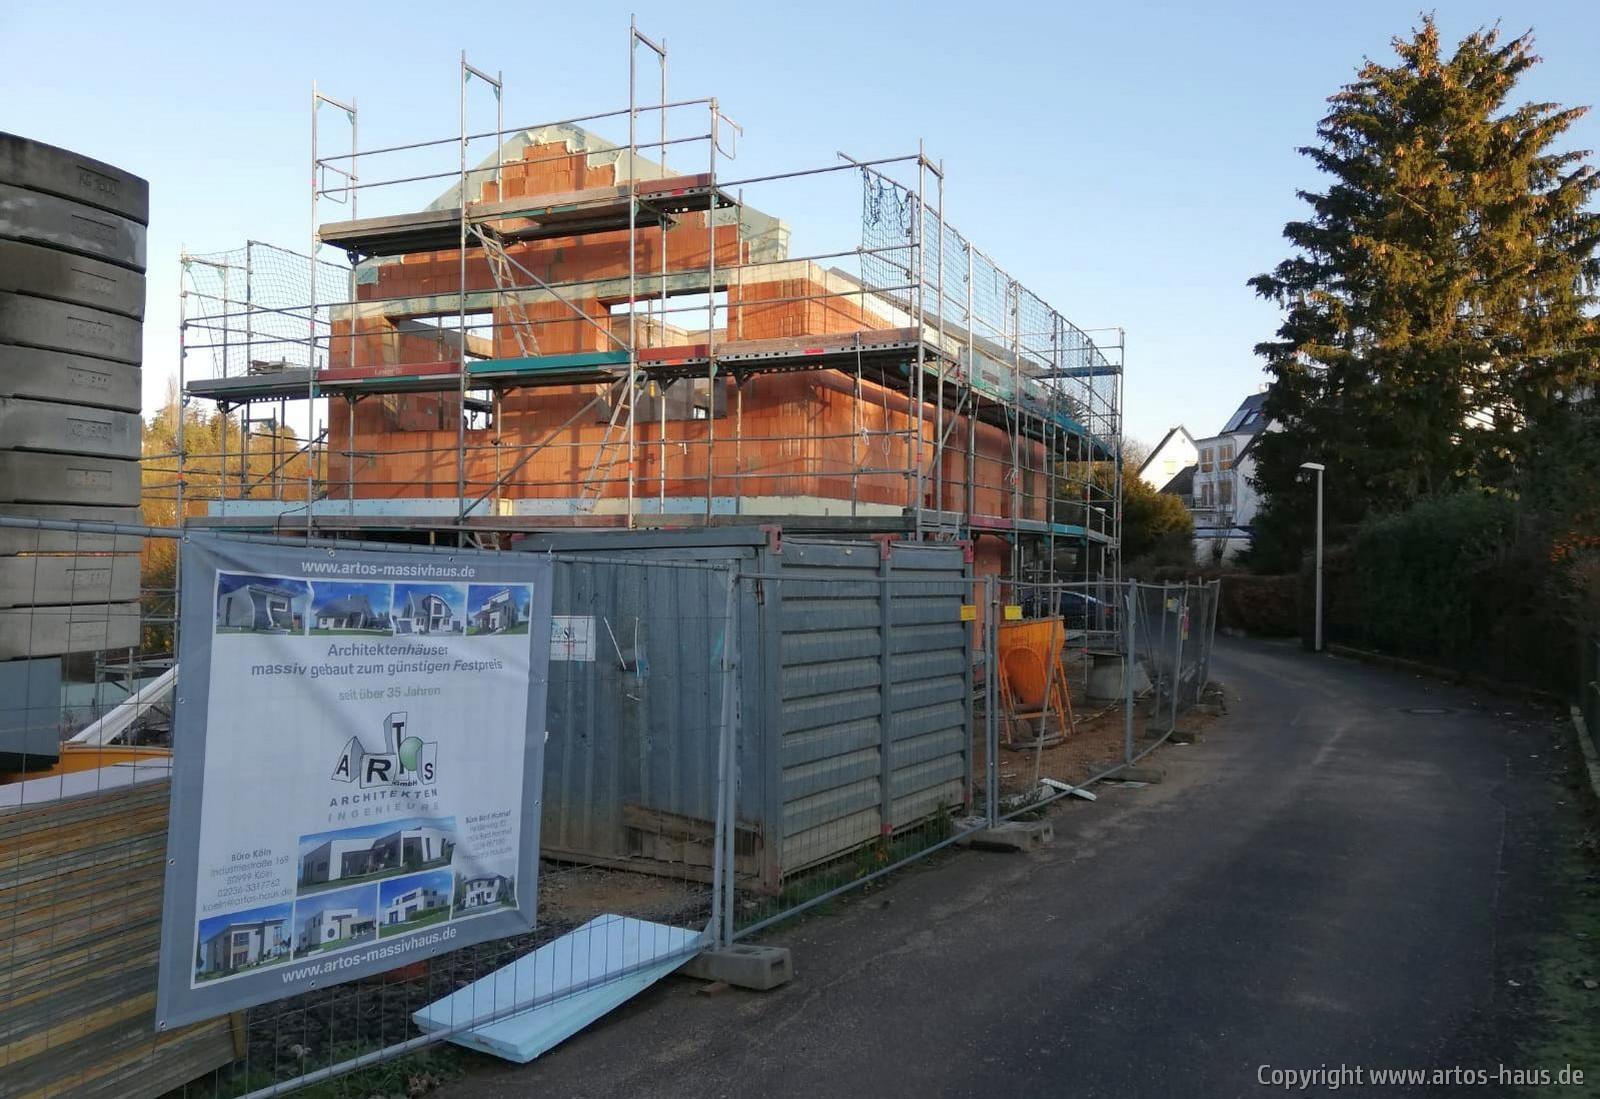 Mauerarbeiten BV ARTOS HAUS 8